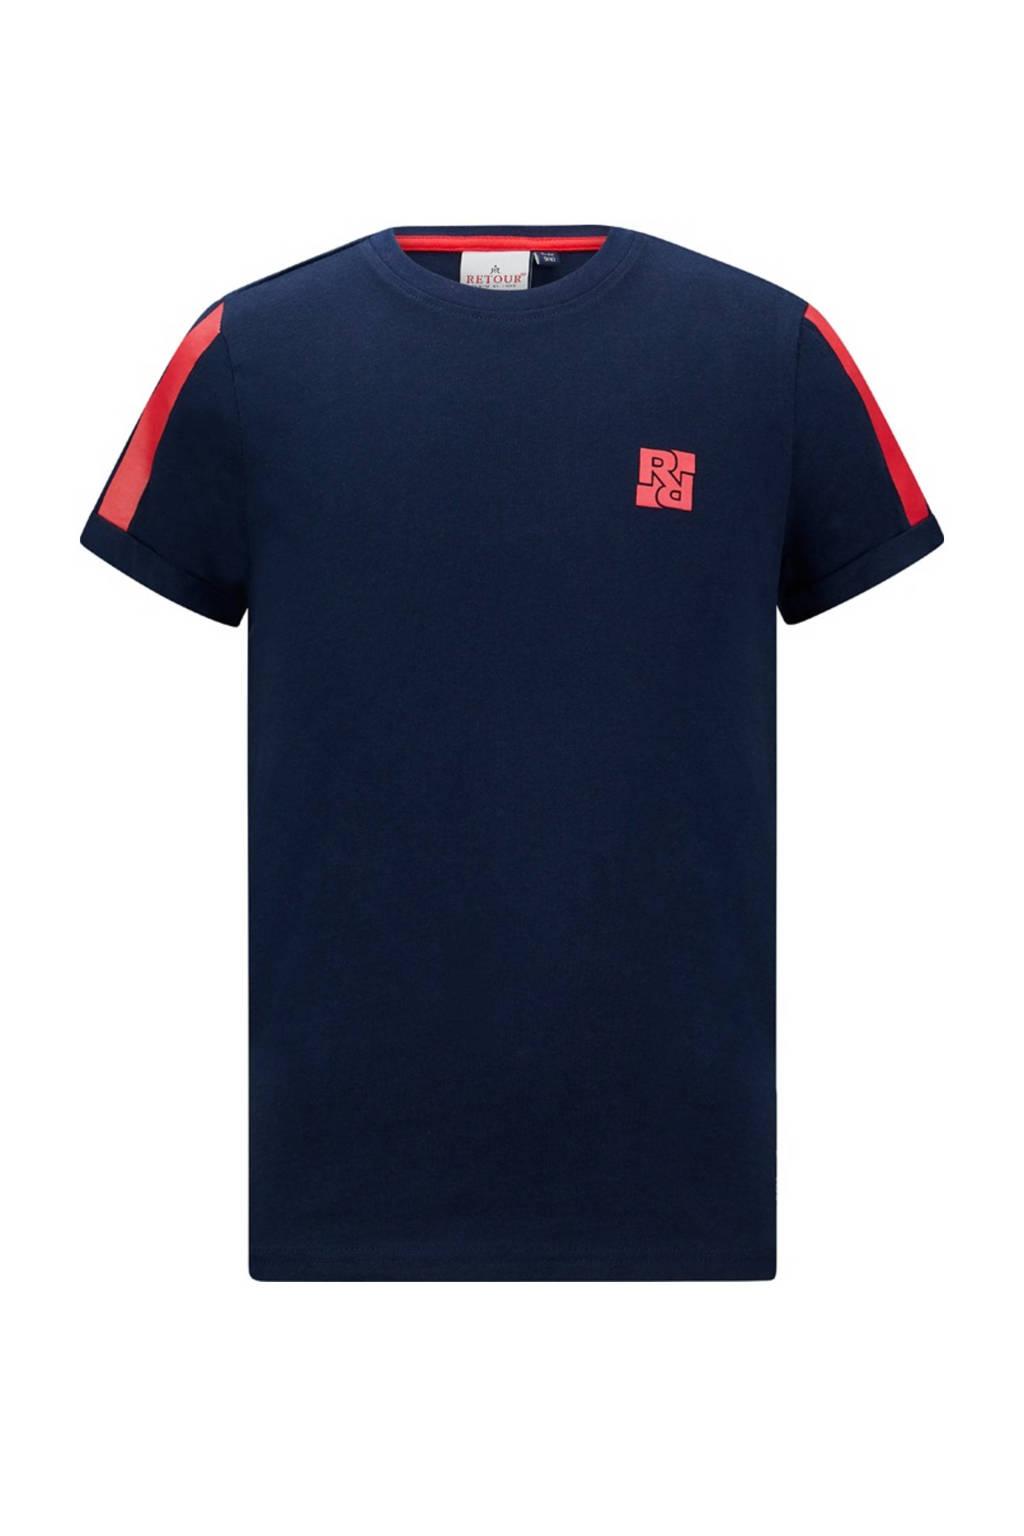 Retour Denim T-shirt Olaf van biologisch katoen donkerblauw/rood, Donkerblauw/rood